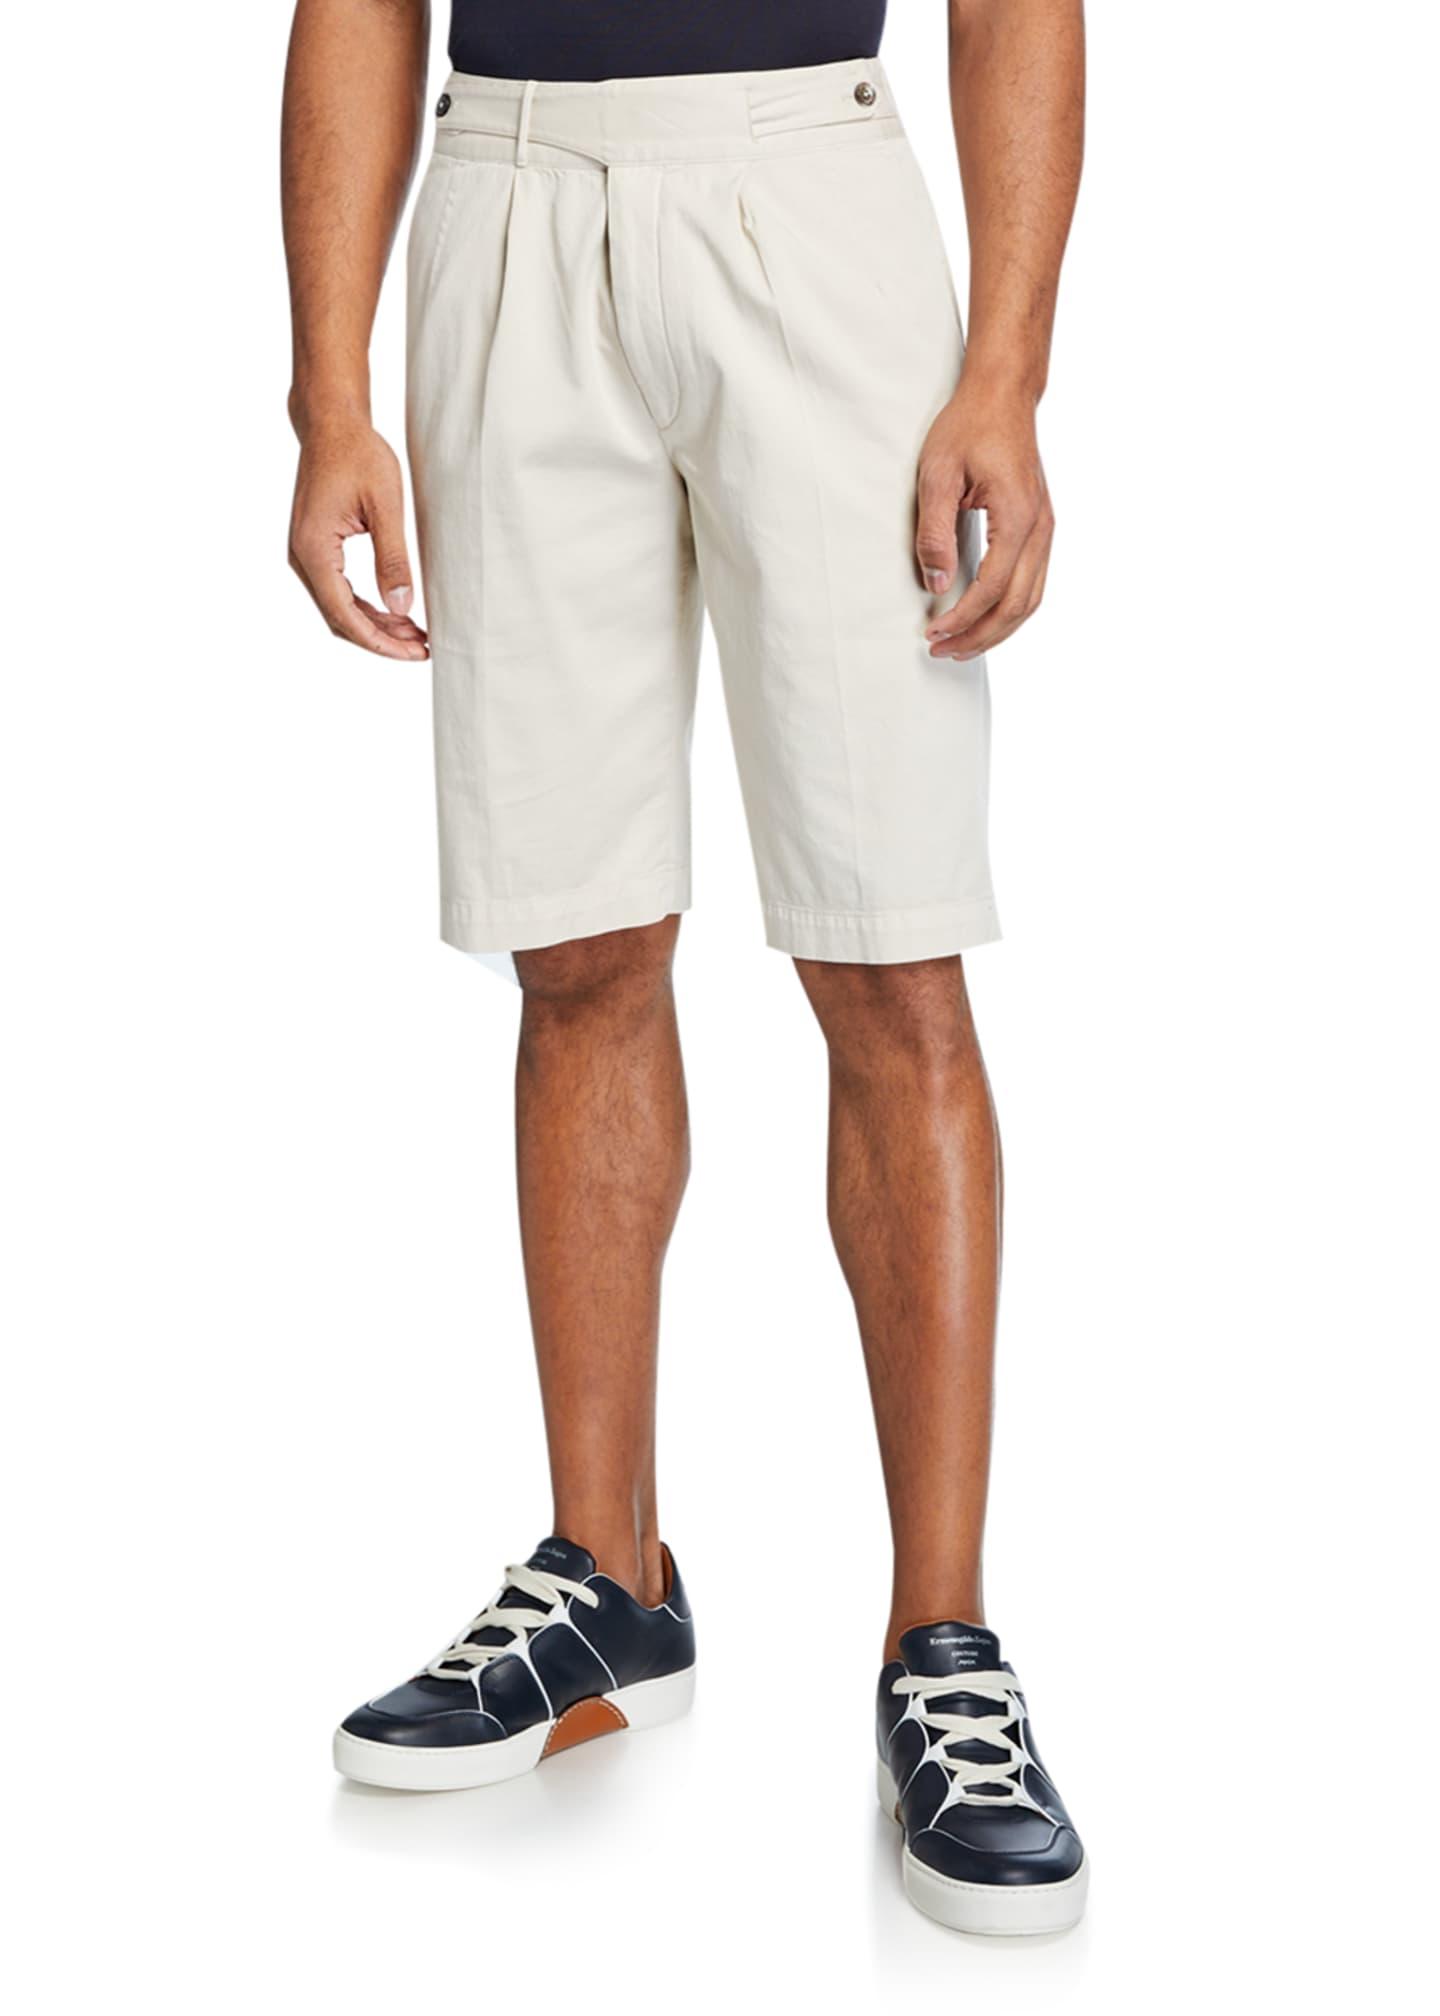 Ermenegildo Zegna Men's Gurkha-Waist Cotton Shorts